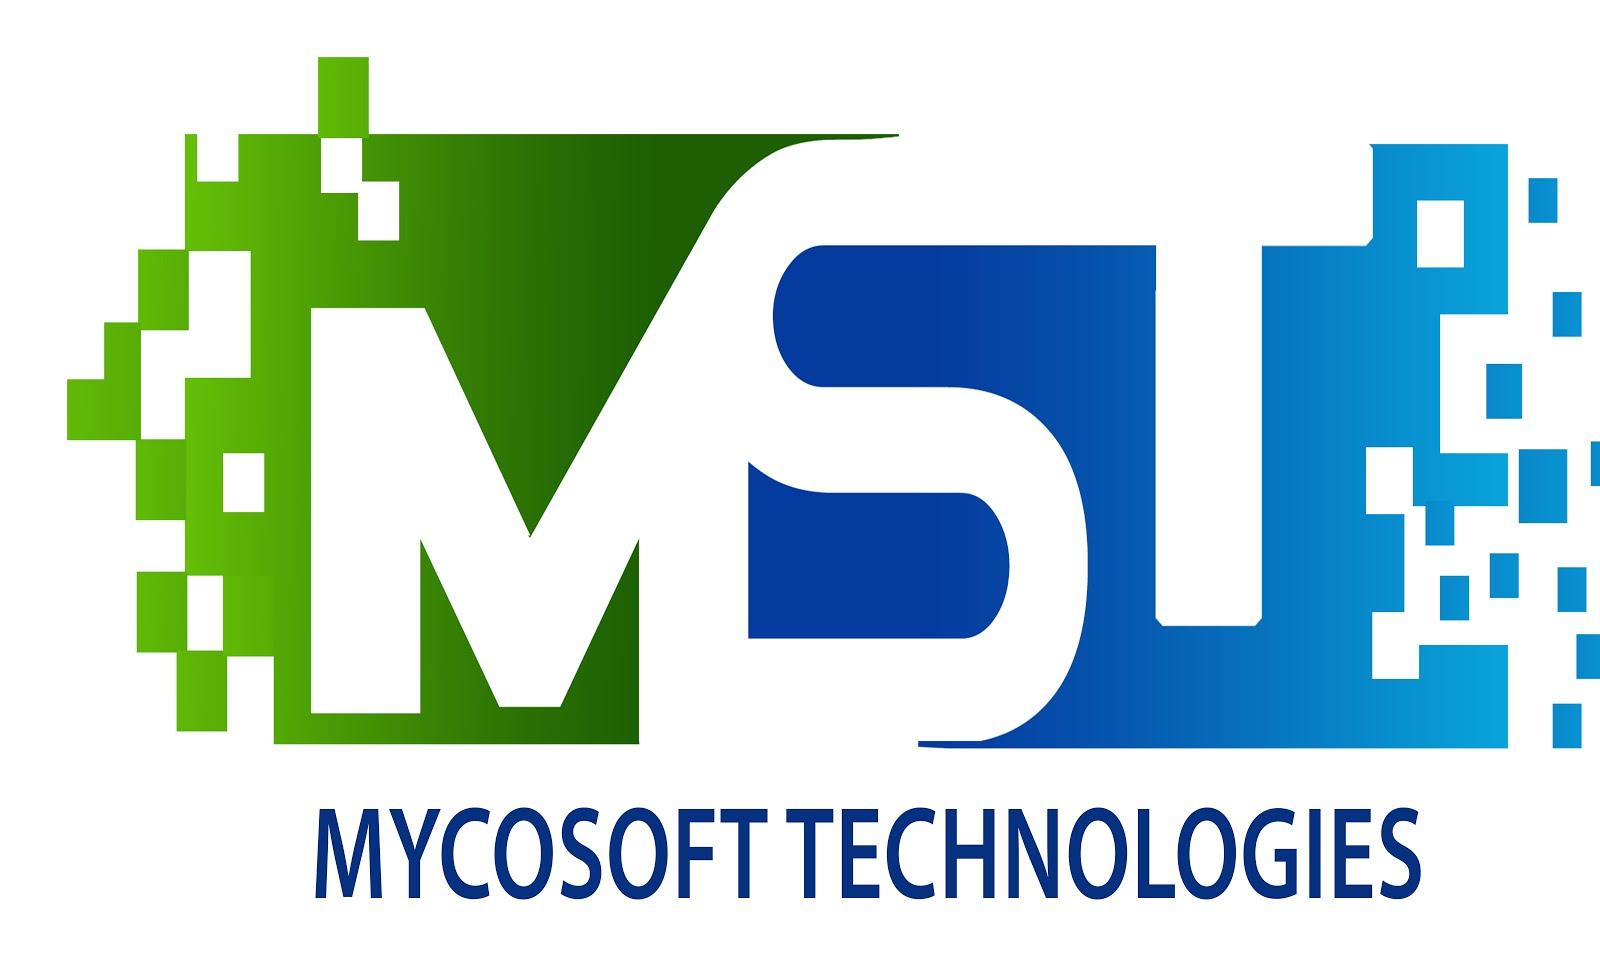 Mycosoft Technologies